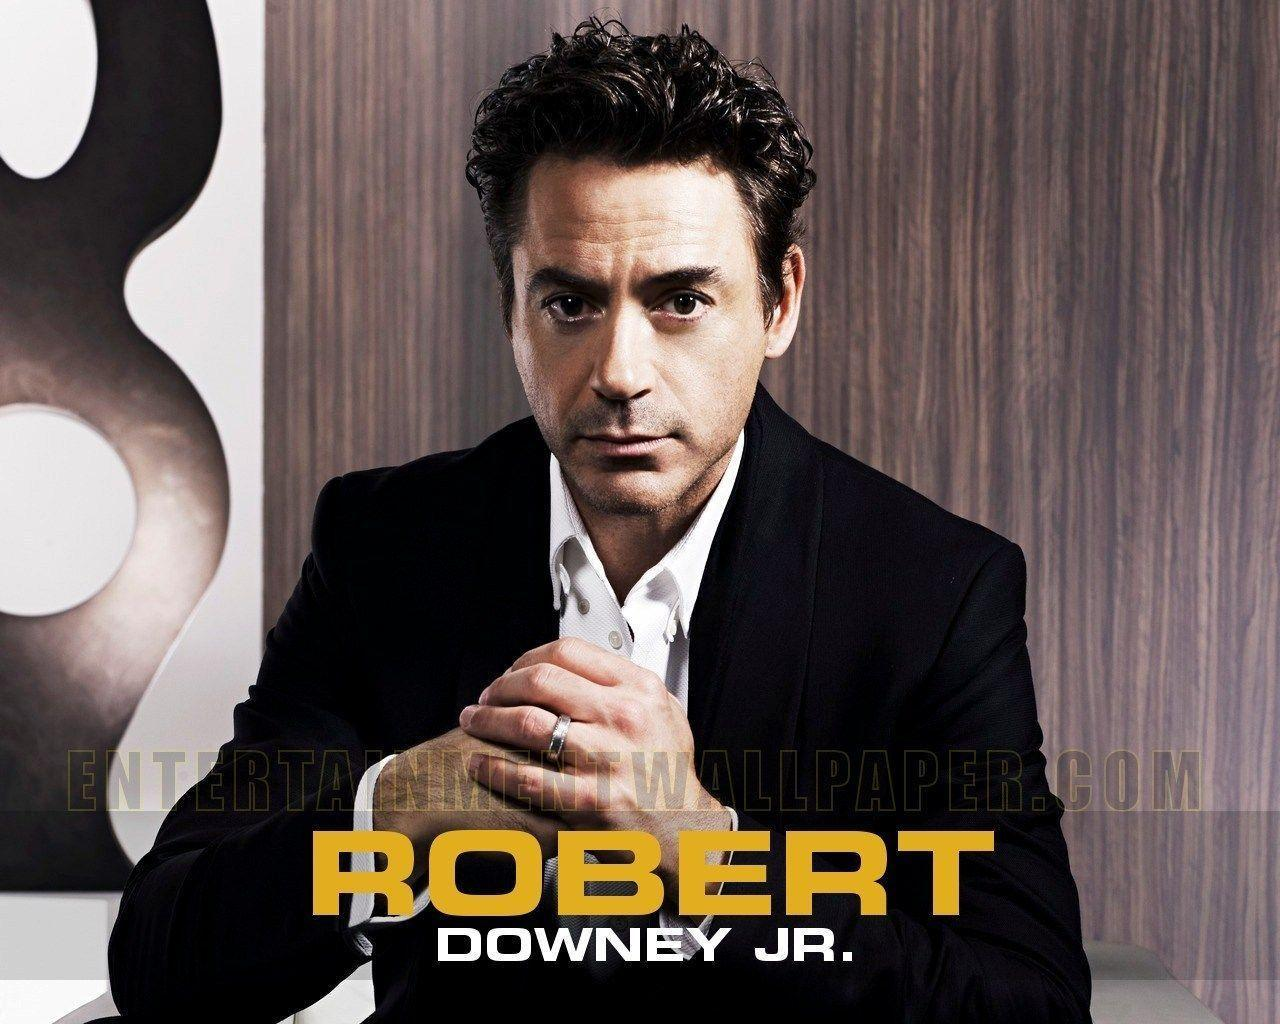 RDJ - Robert Downey Jr. Wallpaper (19465472) - Fanpop